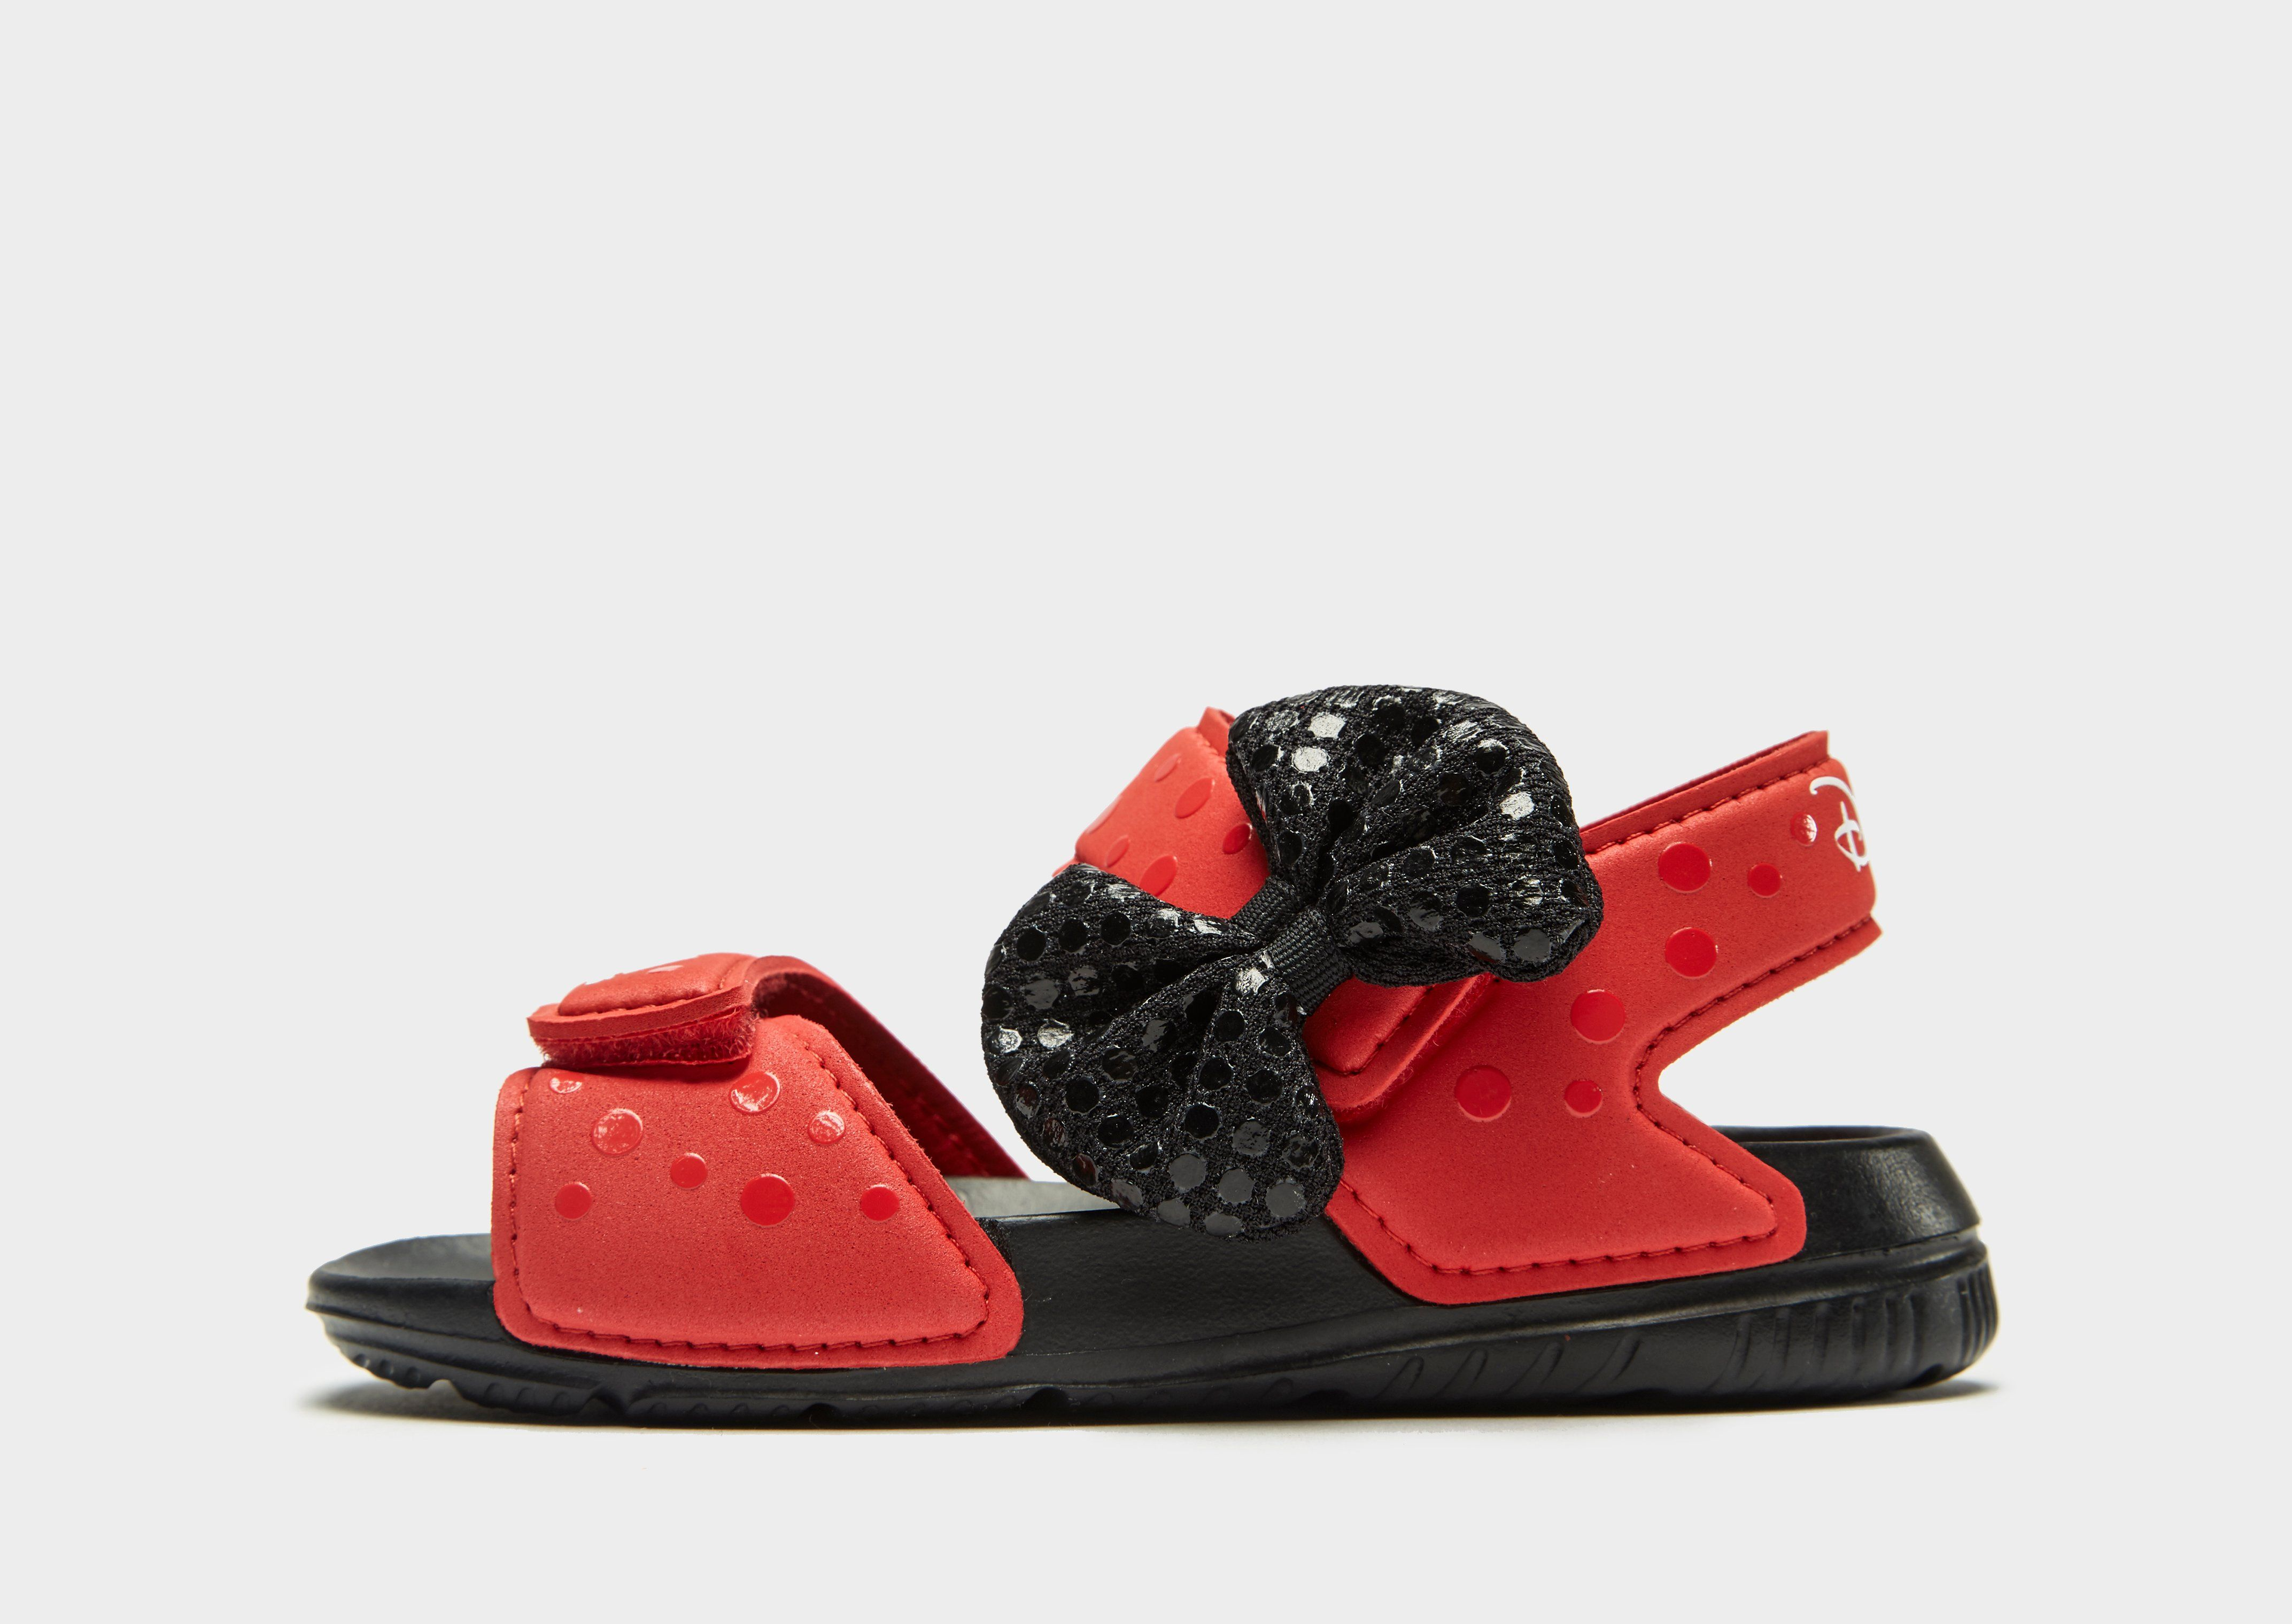 70048f6bfcbb adidas Disney AltaSwim Sandals Infant